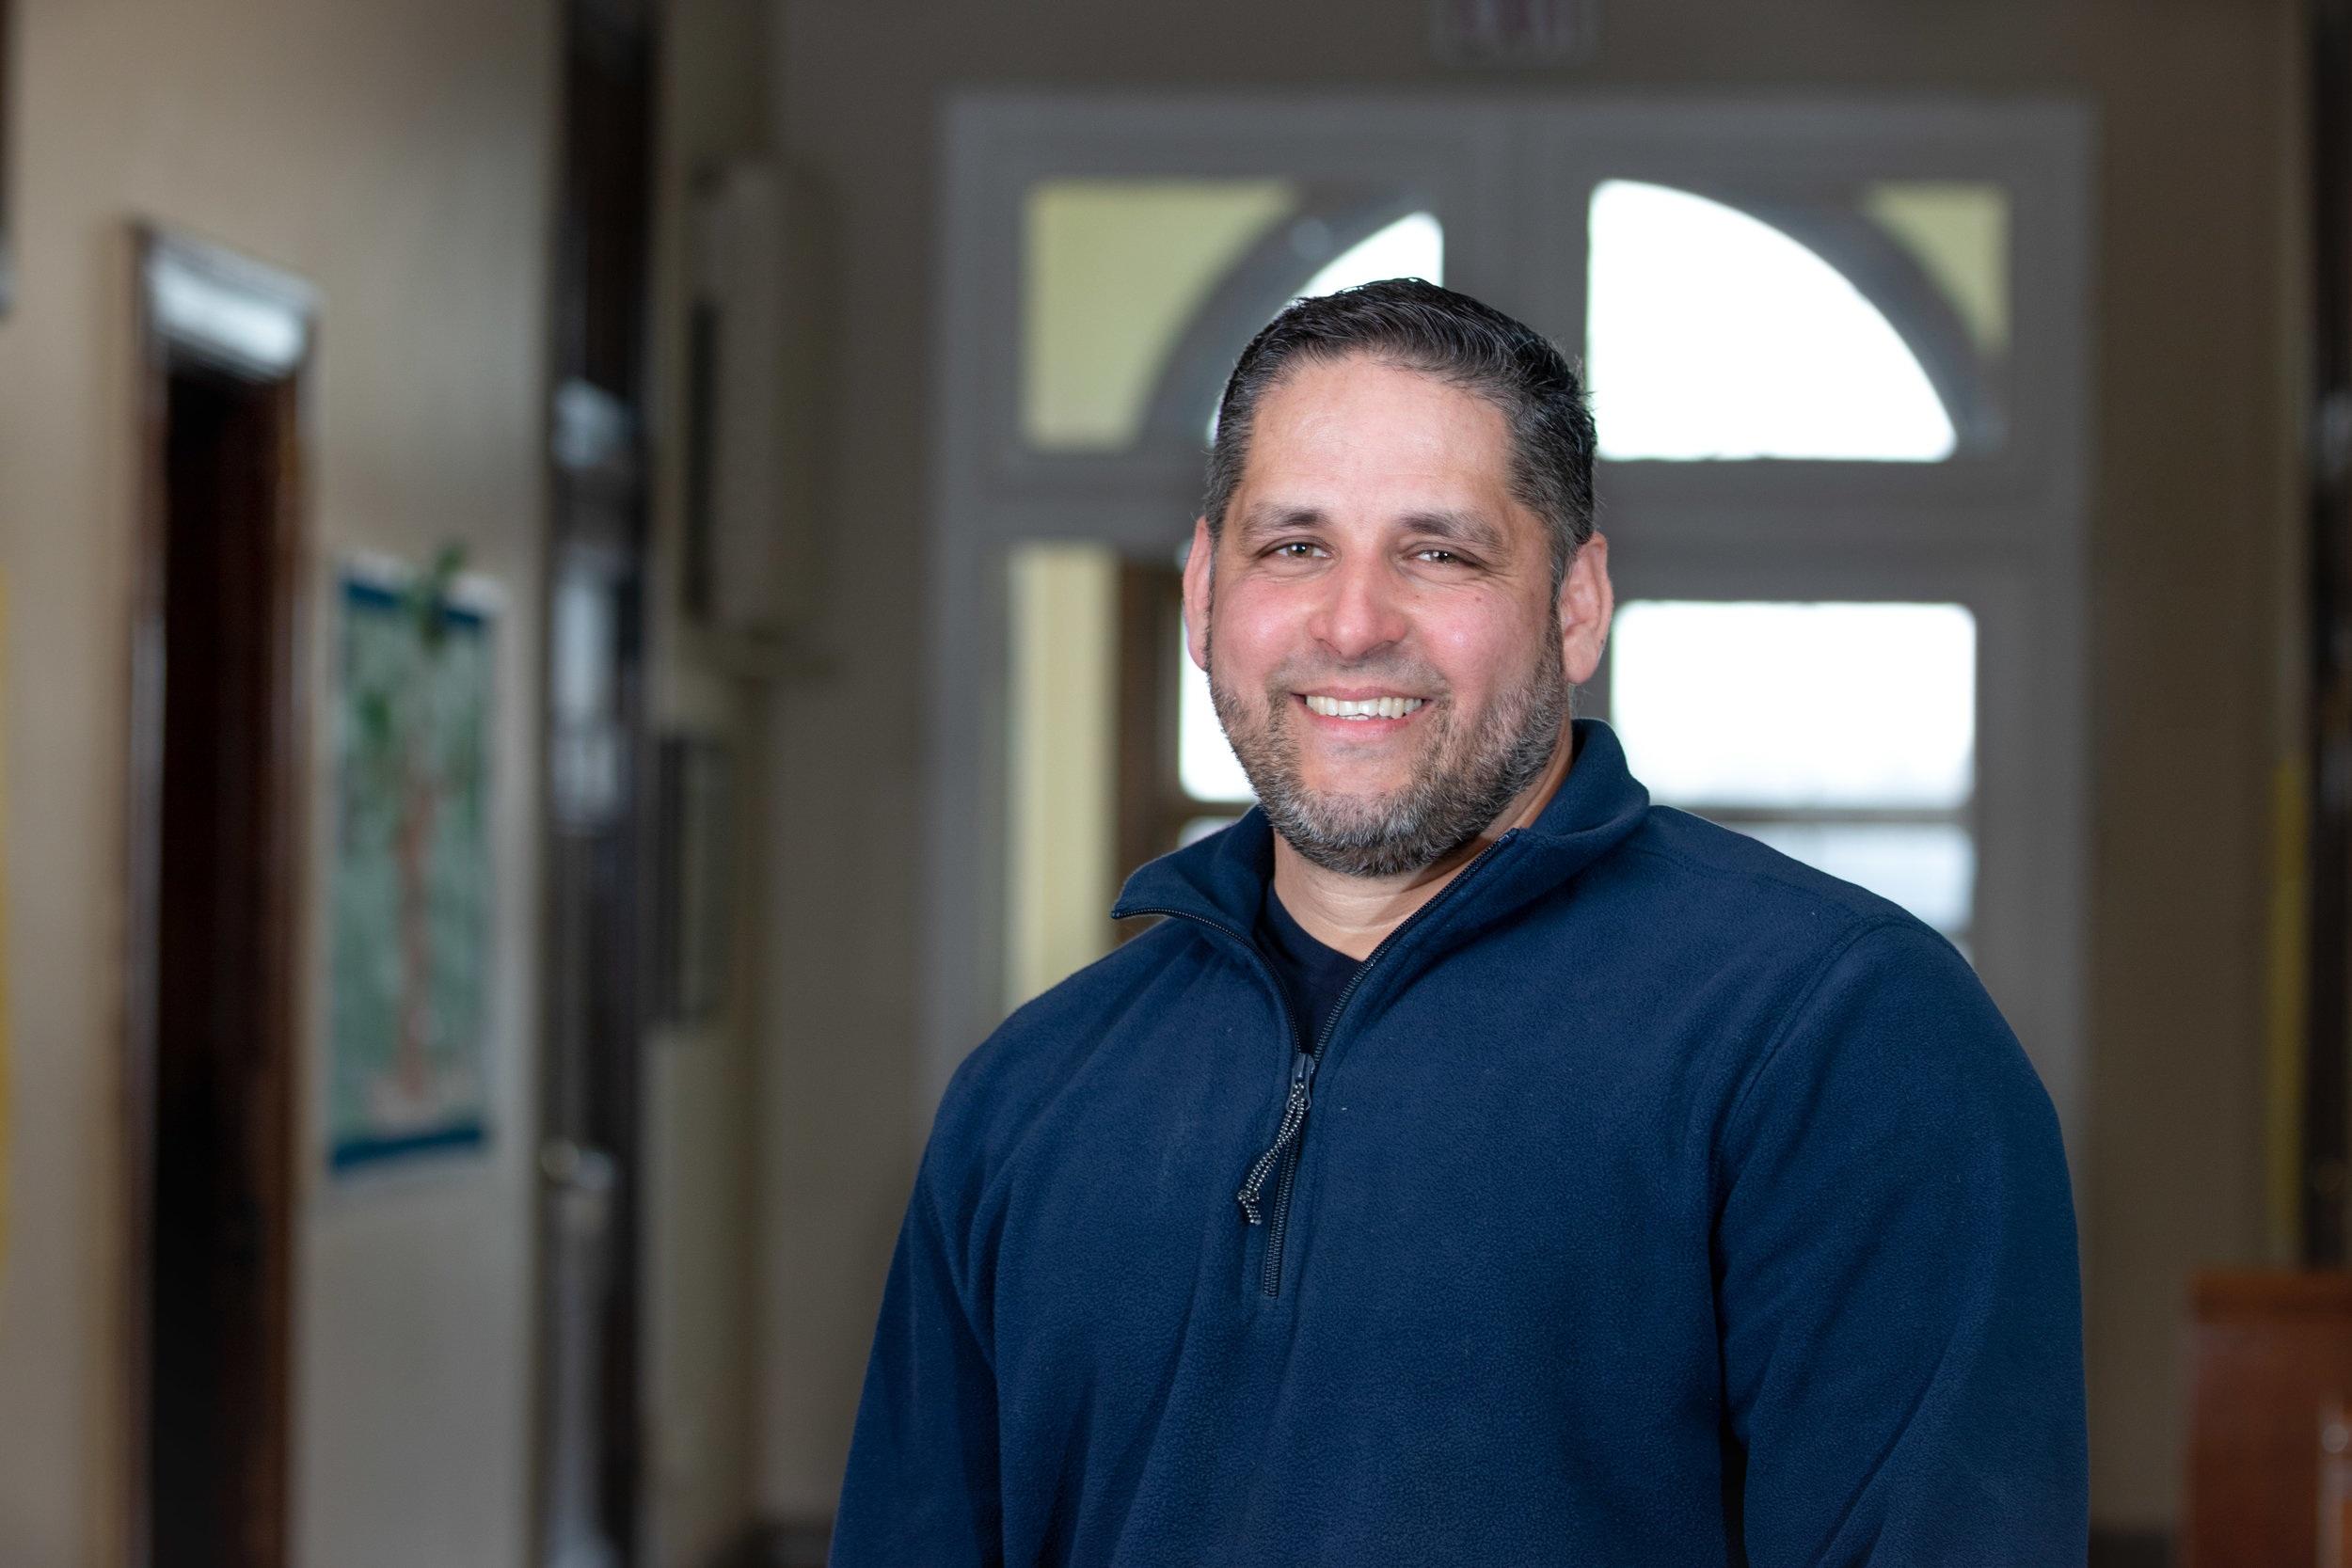 Mr. José Galloza: Facilities Manager